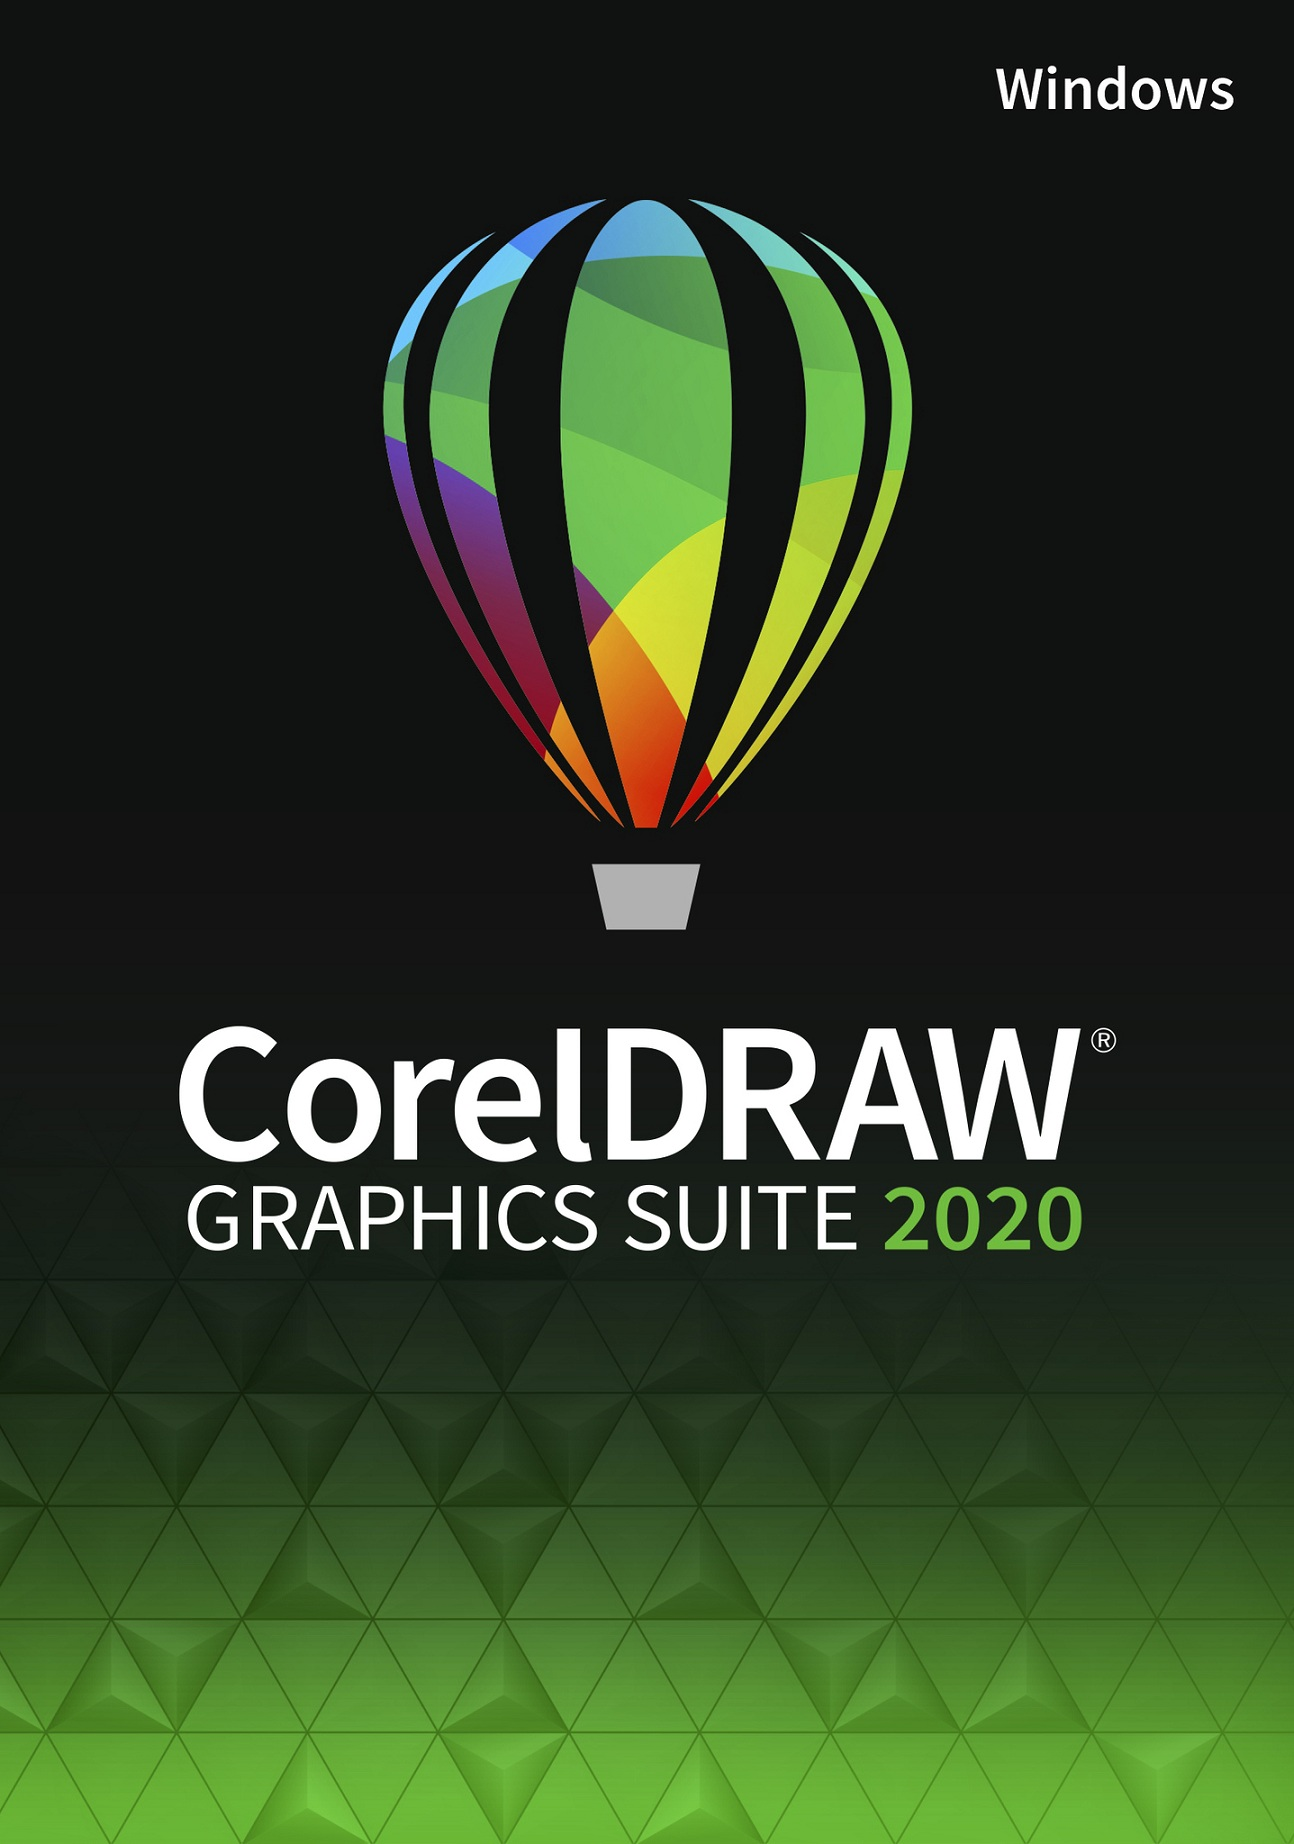 CorelDRAW Graphics Suite 2020 Class Lic. Win 15+1